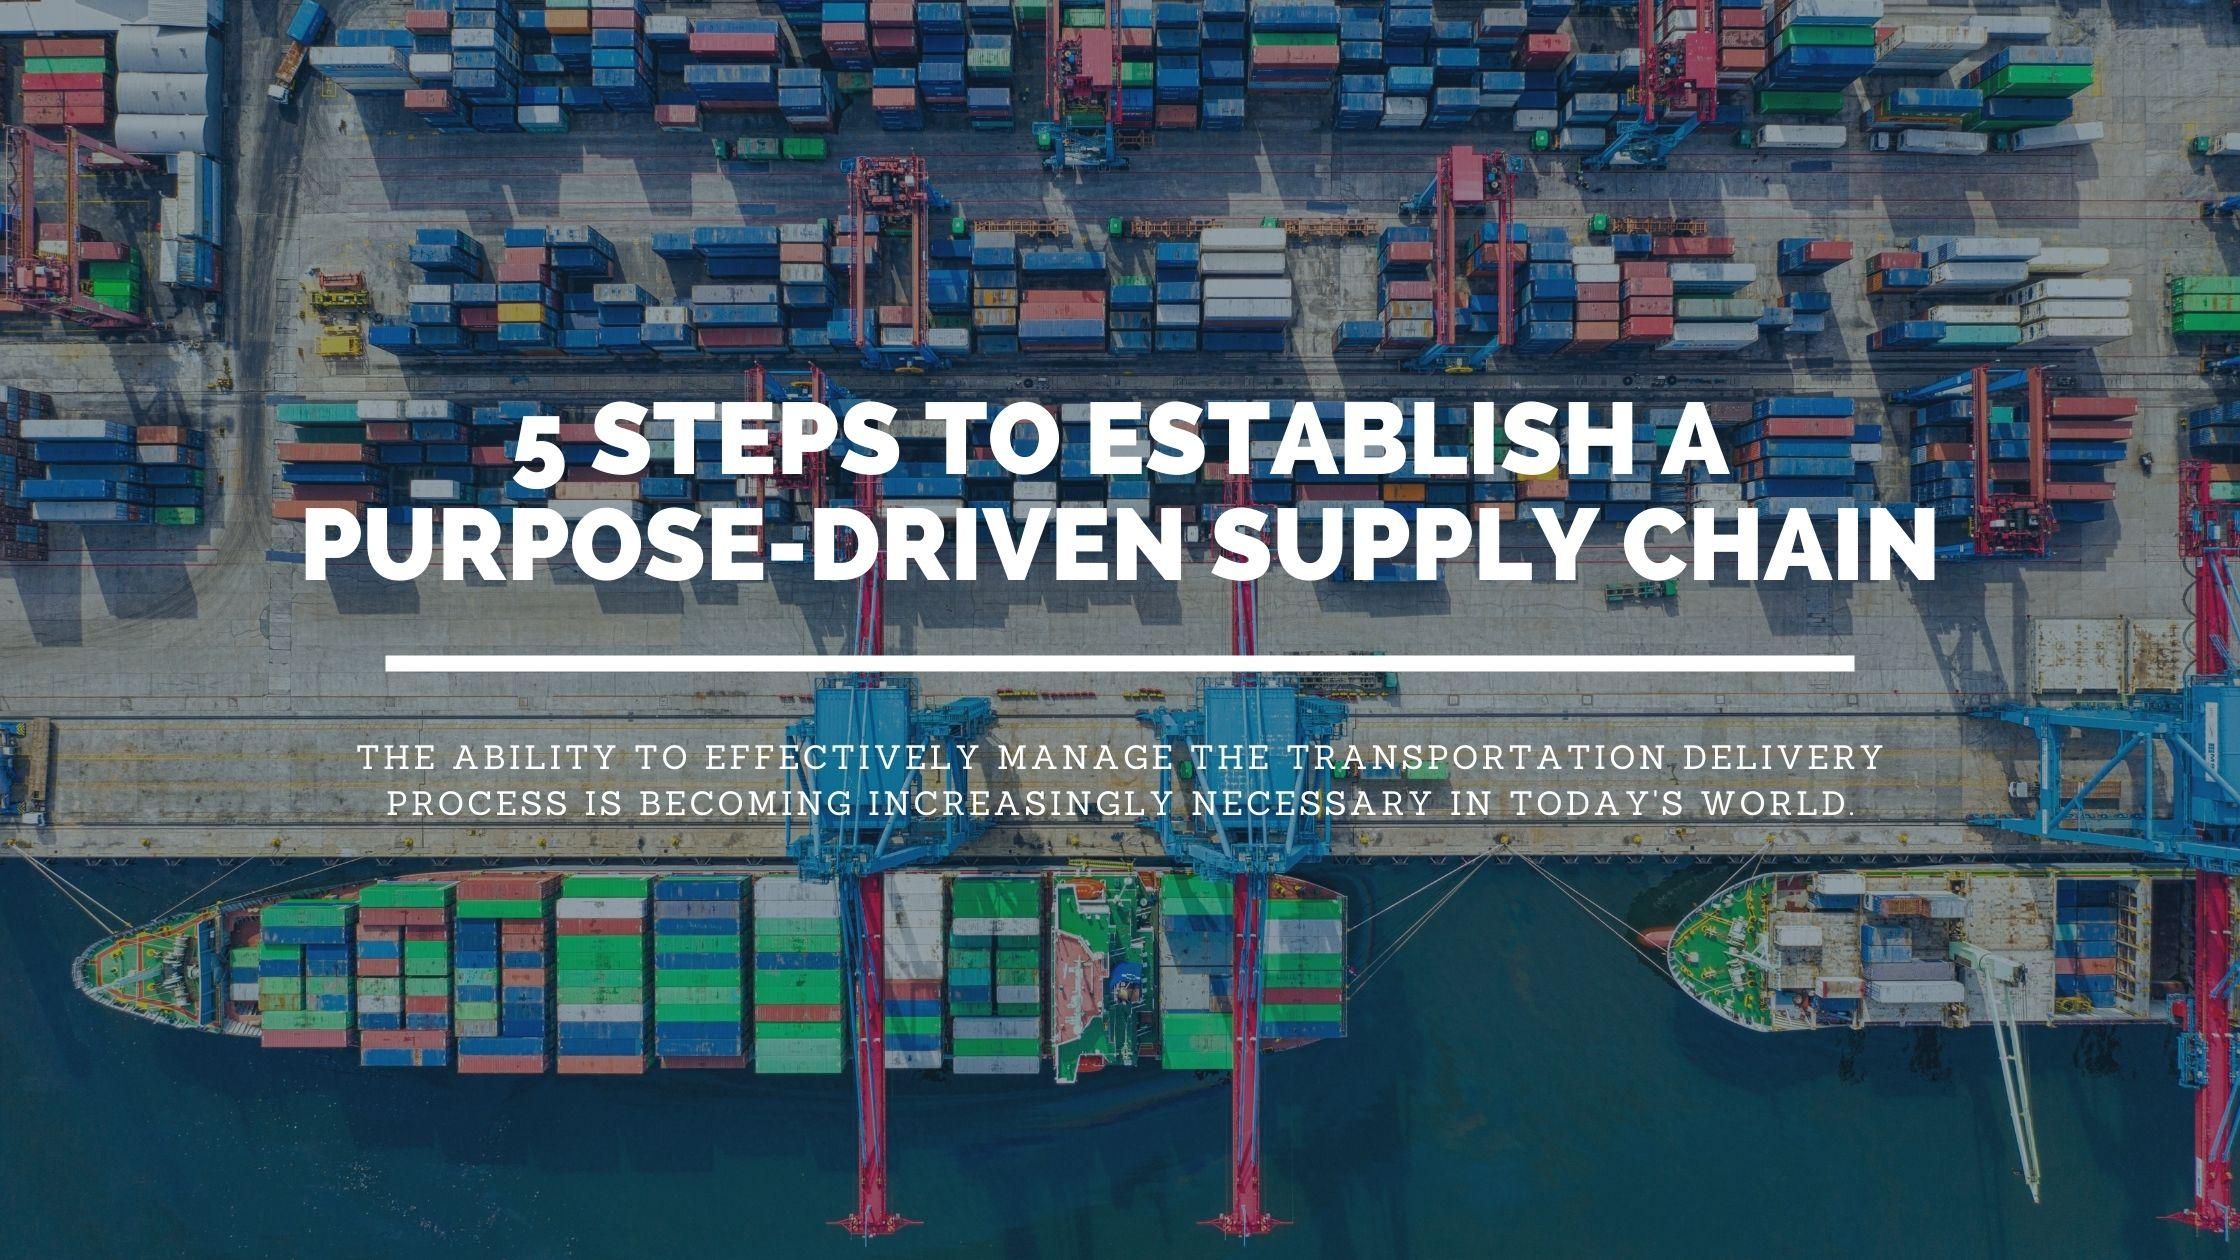 5 Steps to Establish a Purpose-Driven Supply Chain